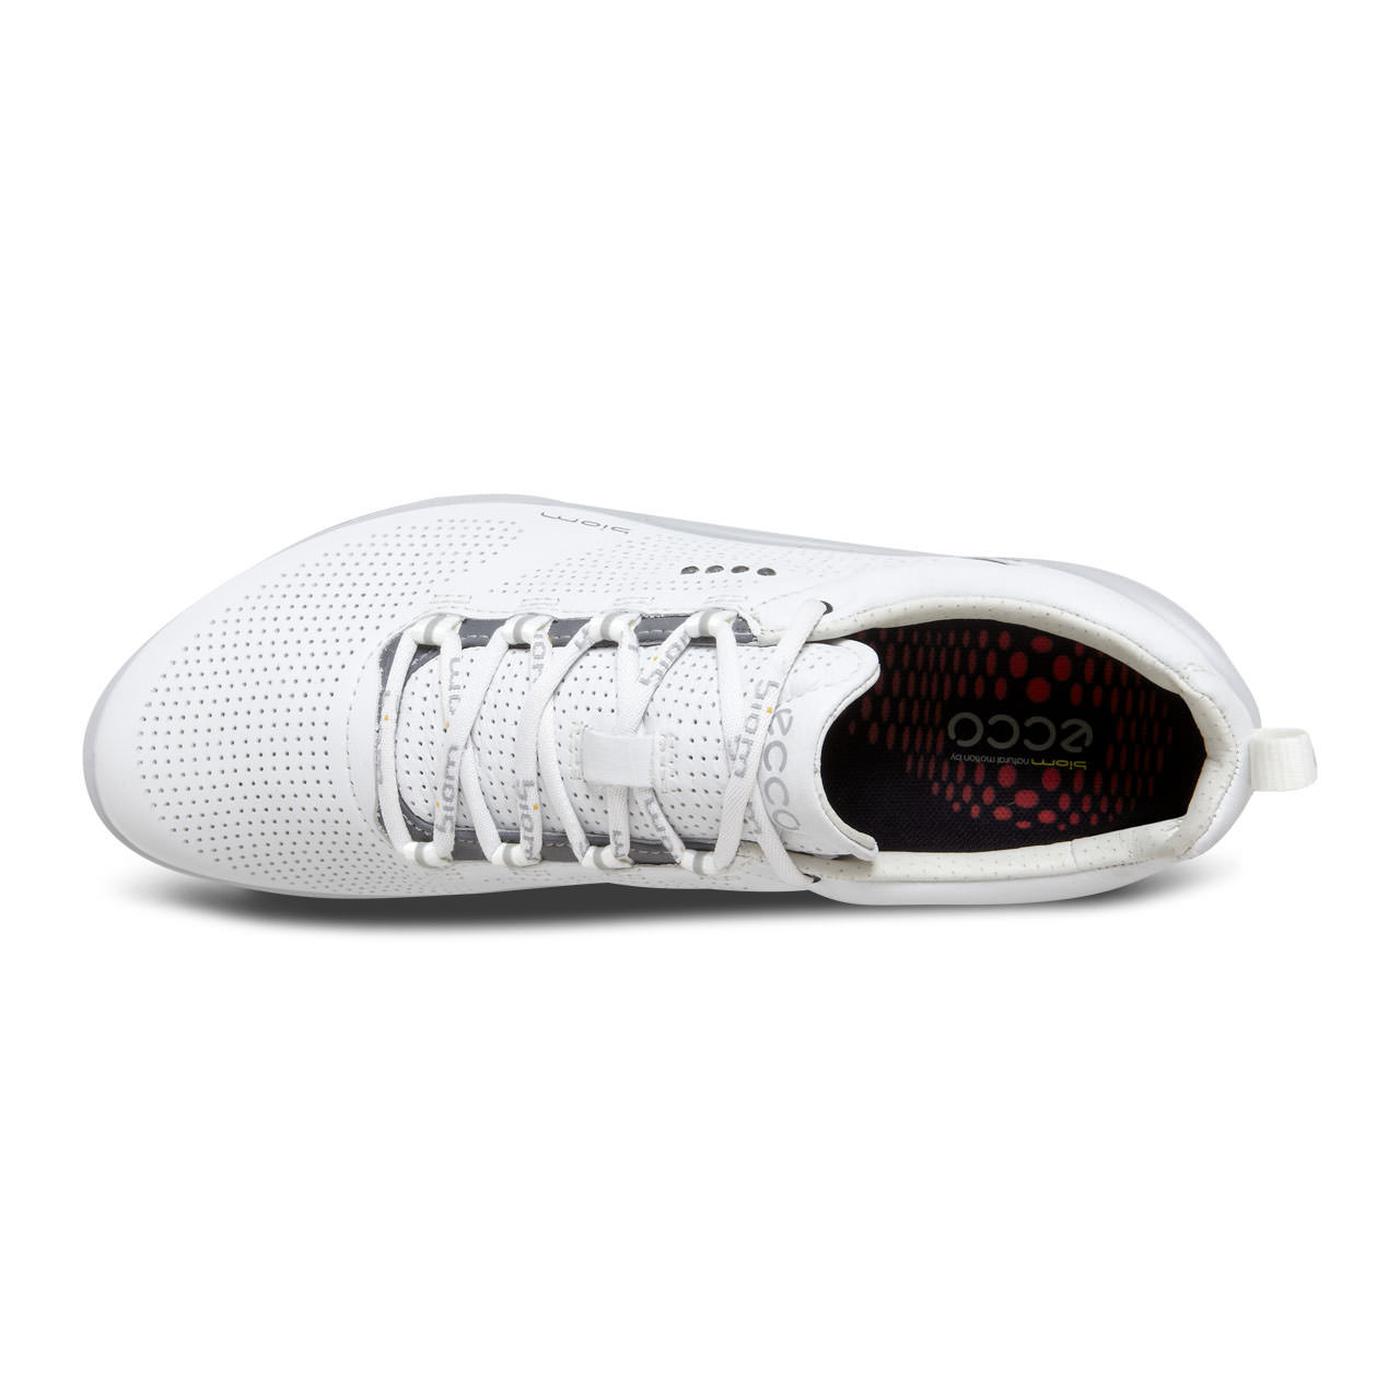 ECCO BIOM FJUEL Womens Sneaker Tie